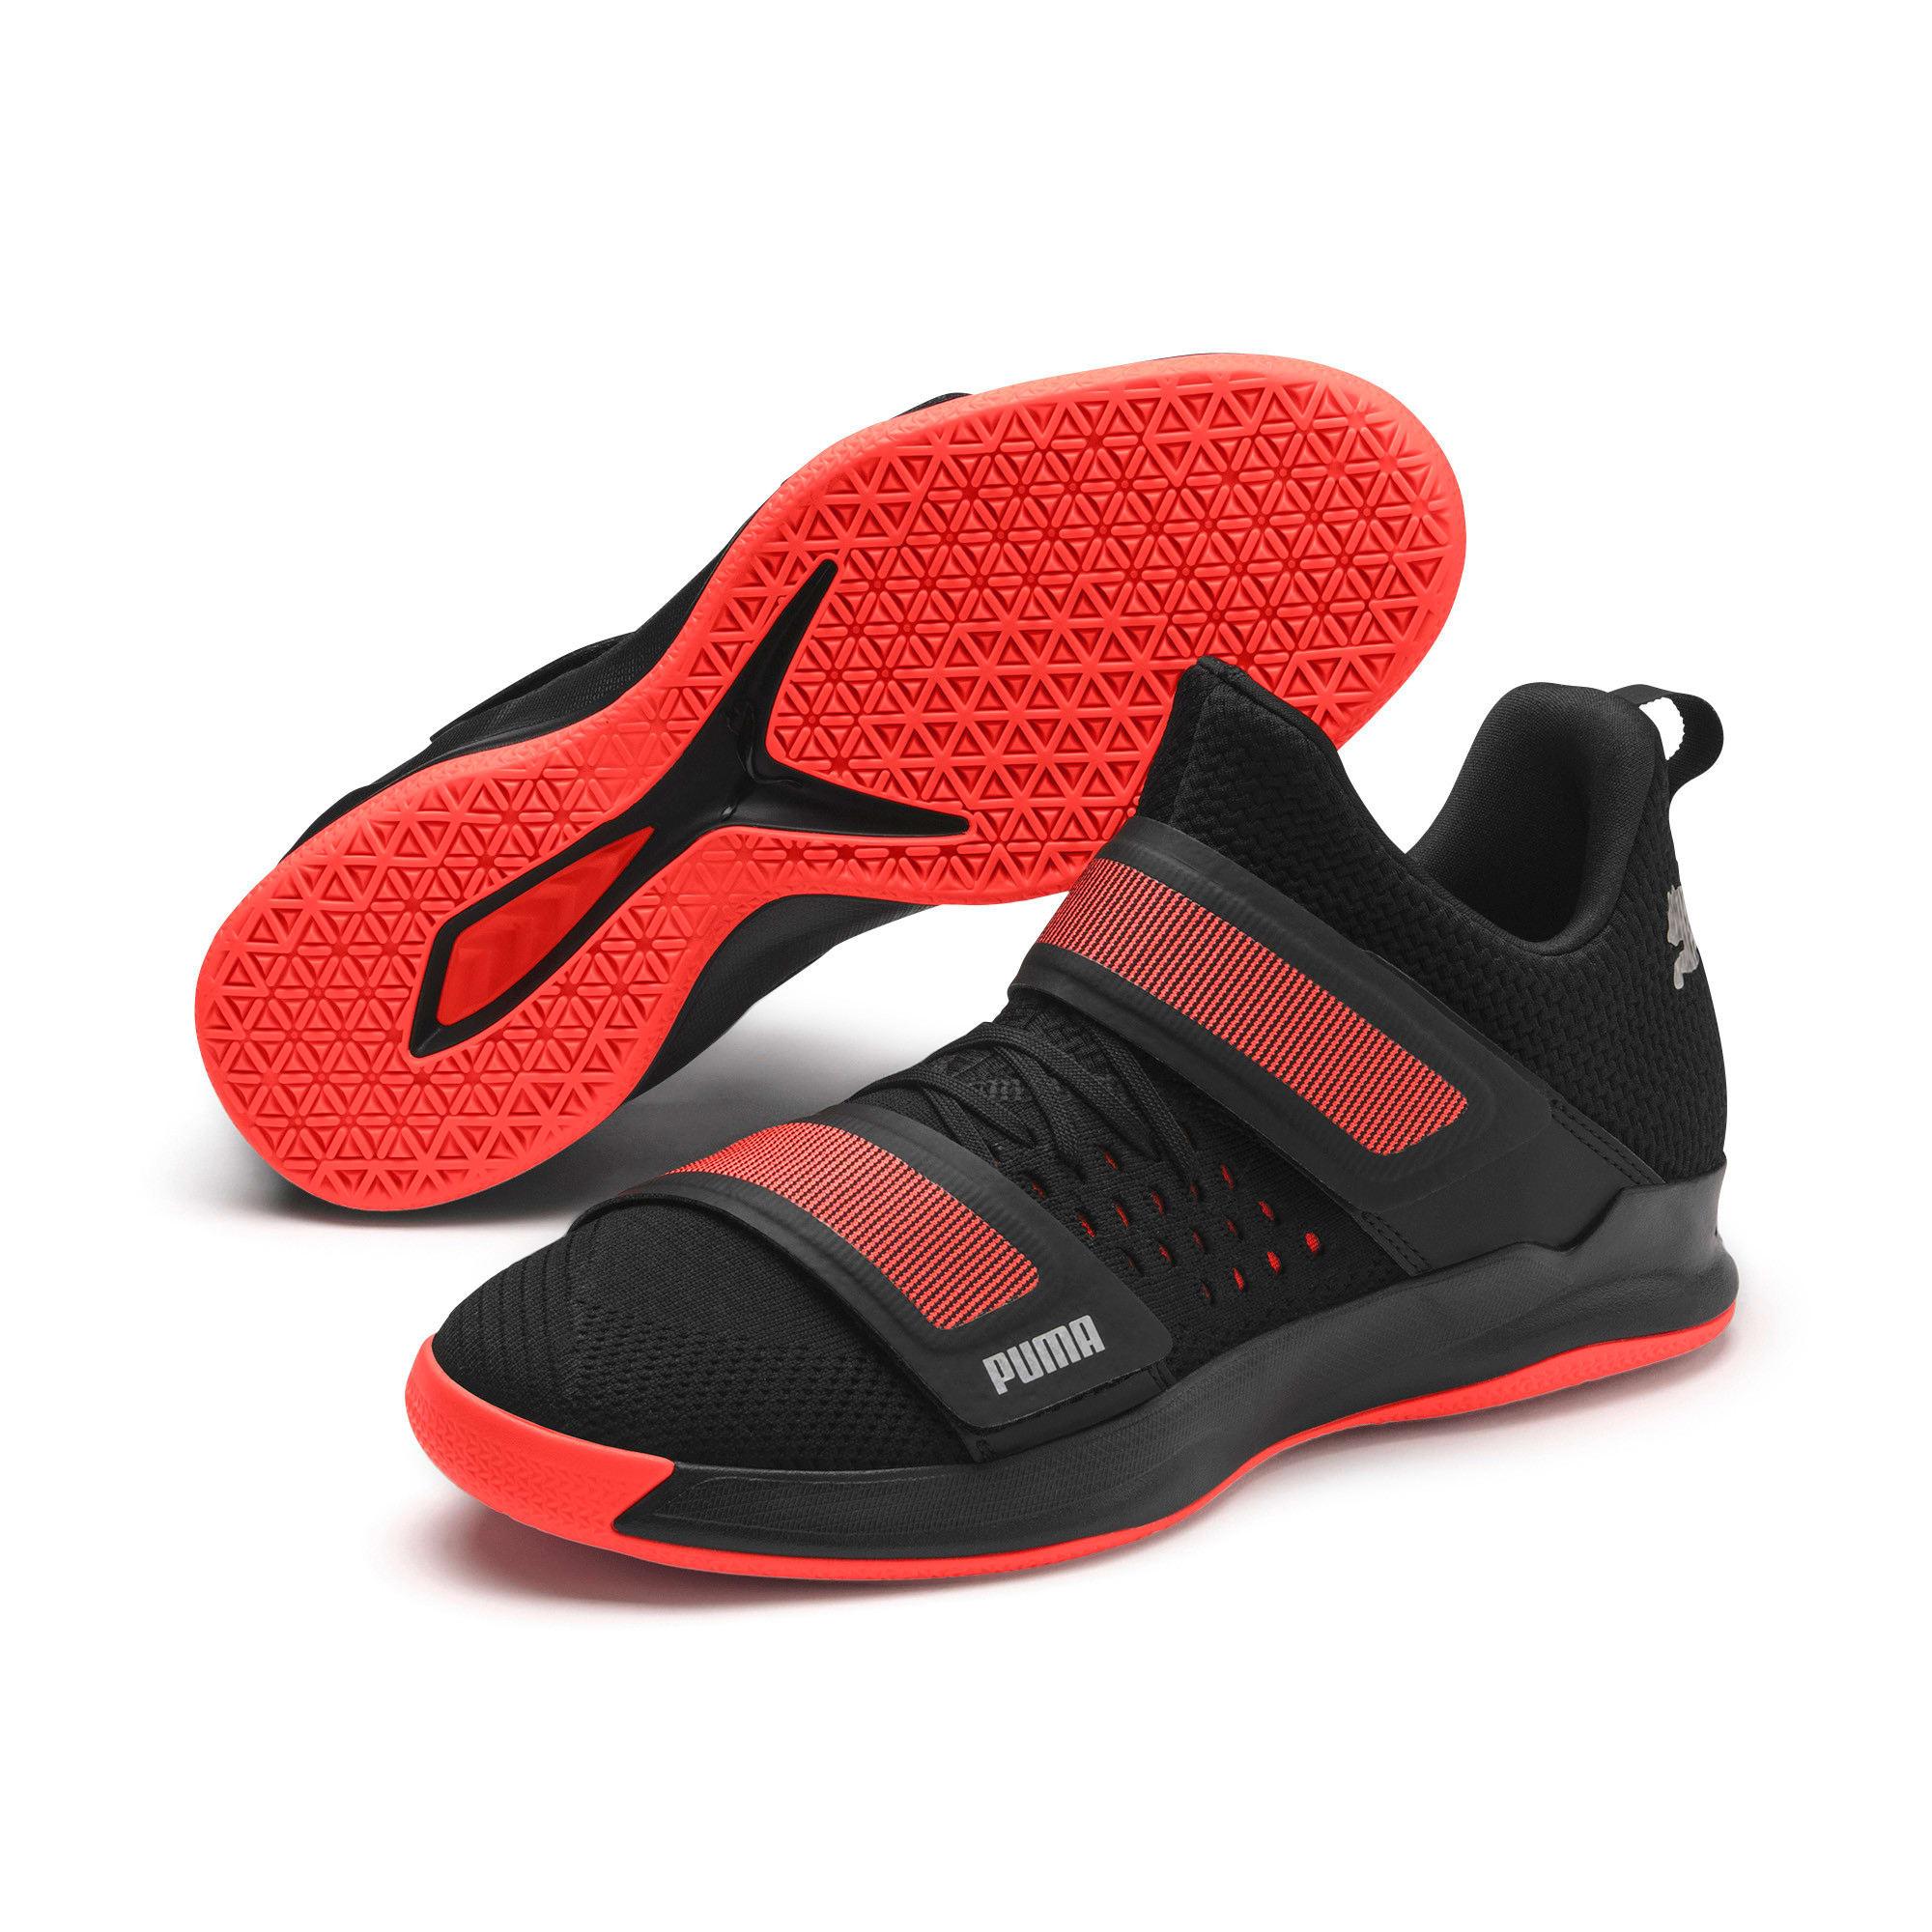 Thumbnail 3 of Rise XT3 NETFIT Handball Shoes, Puma Black-Silver-Nrgy Red, medium